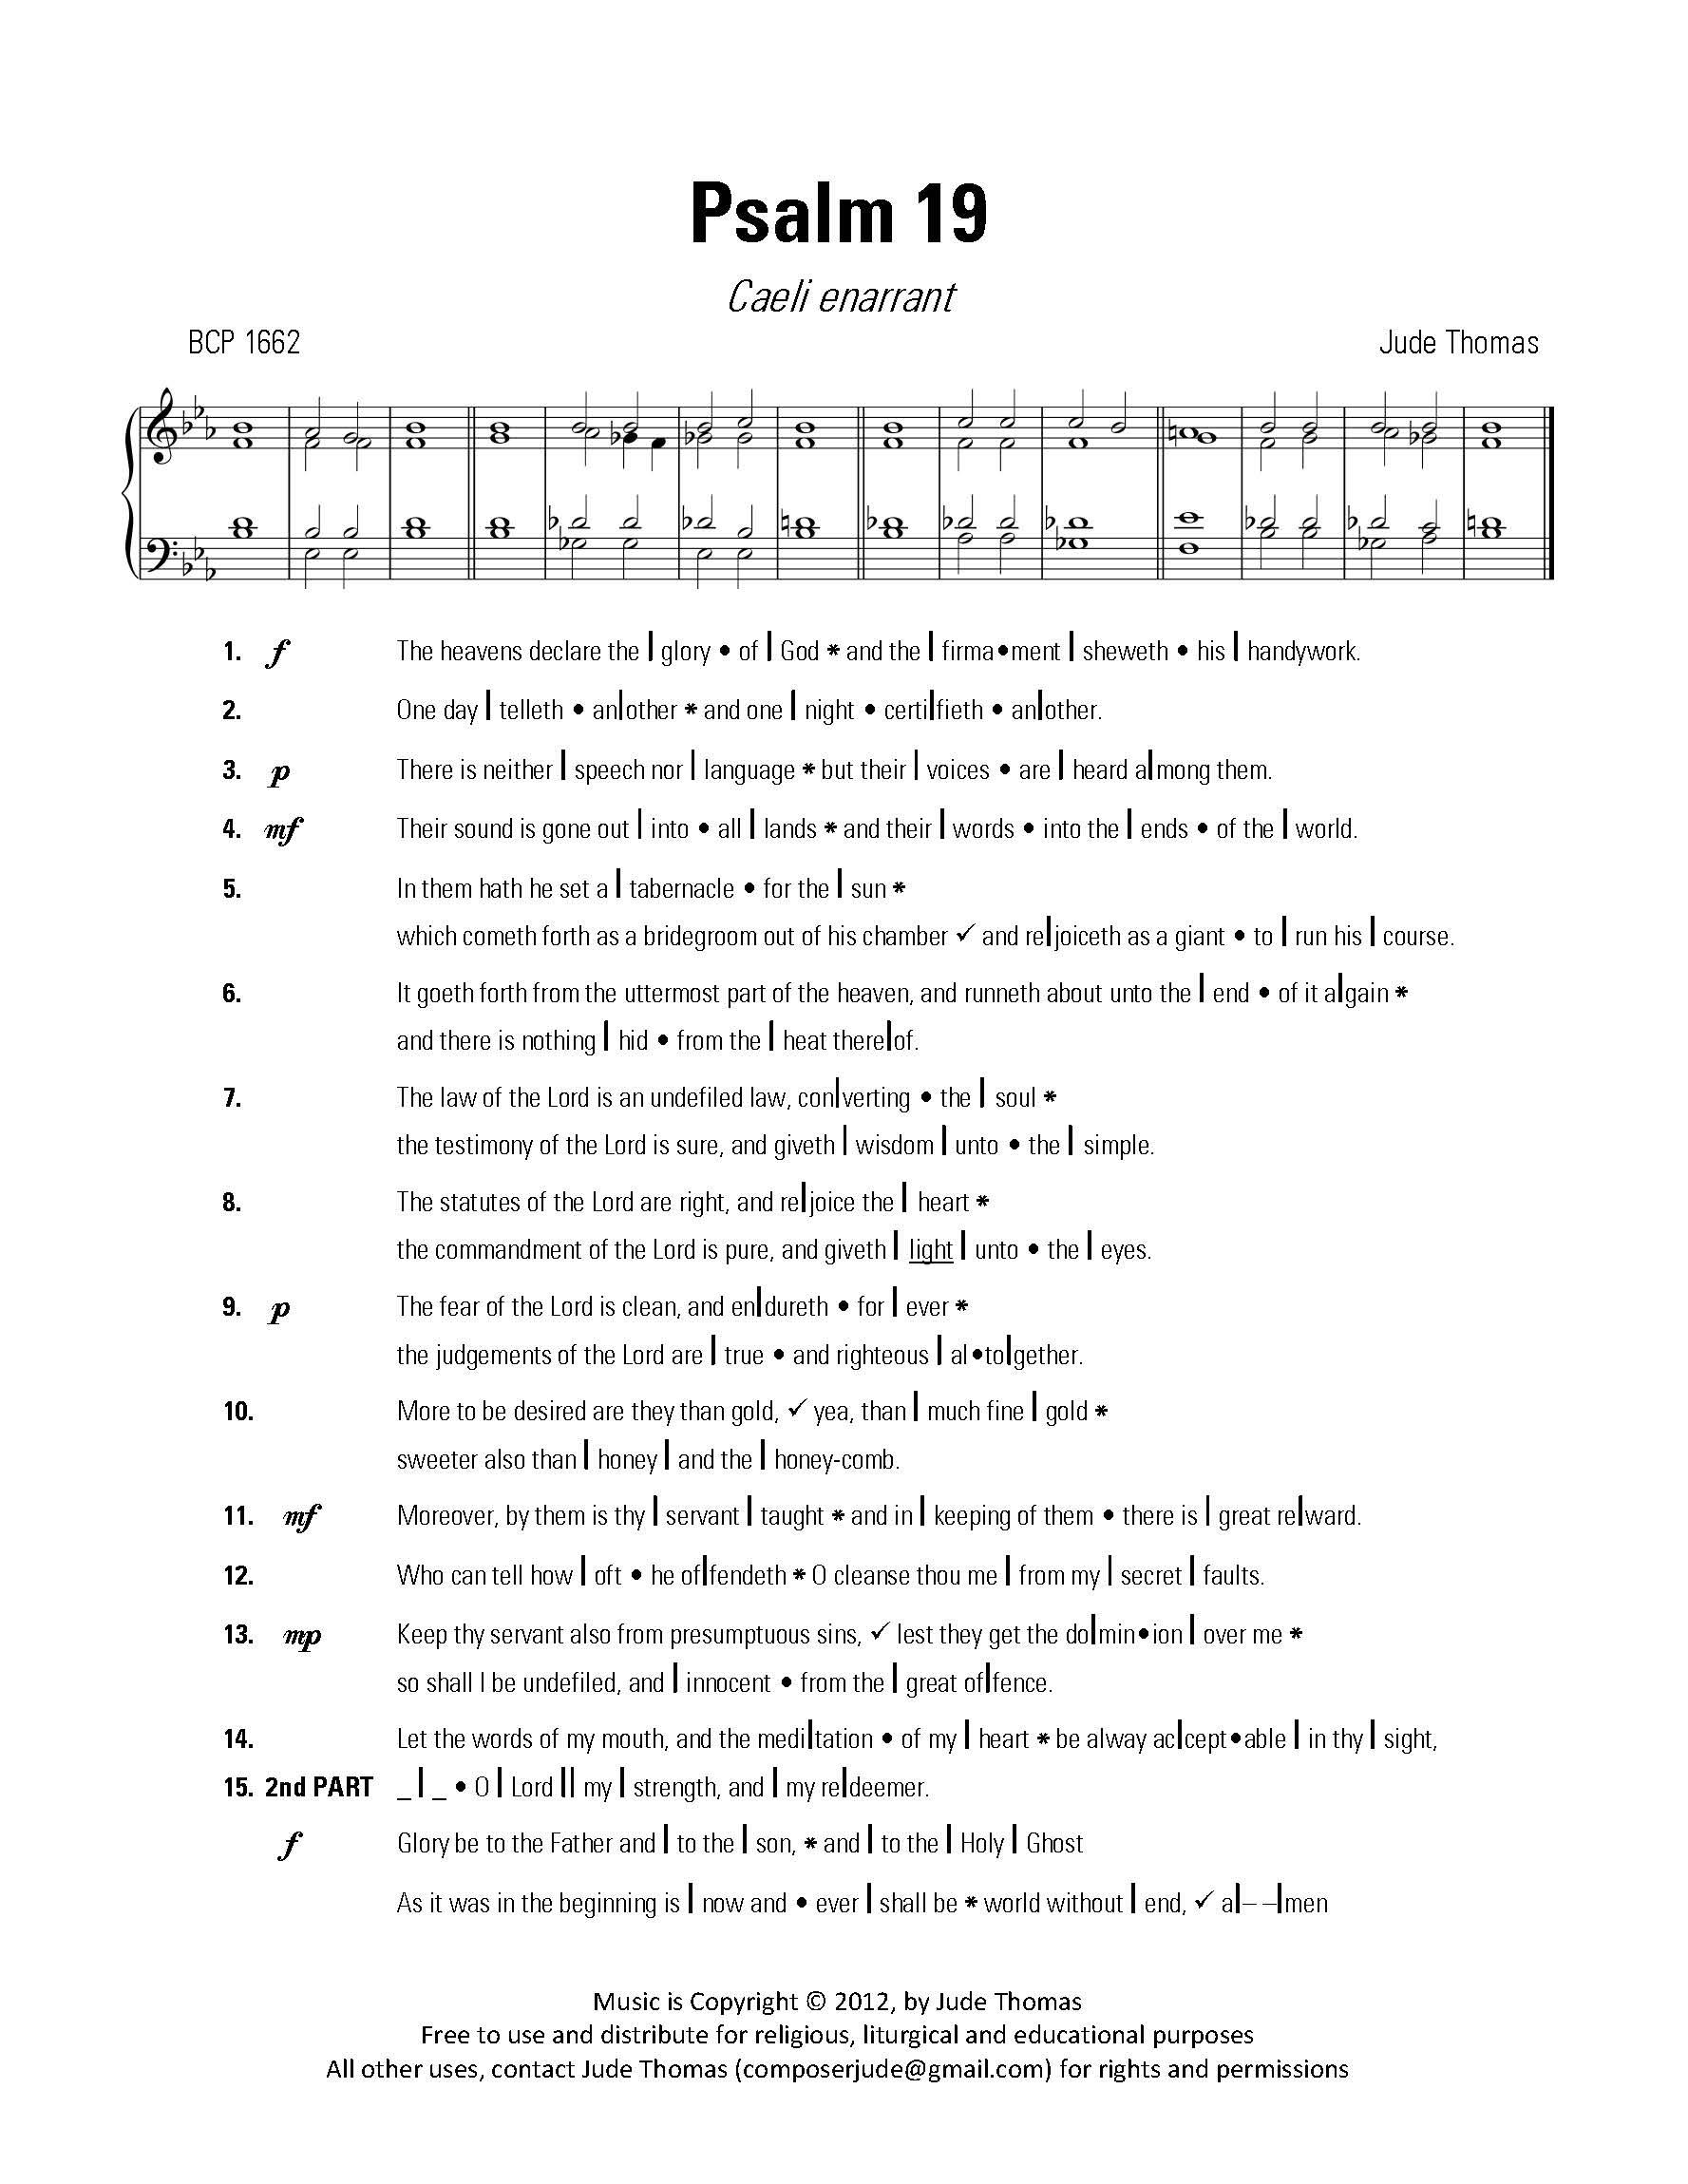 caeli enerrant a new anglican psalm chant jude thomas